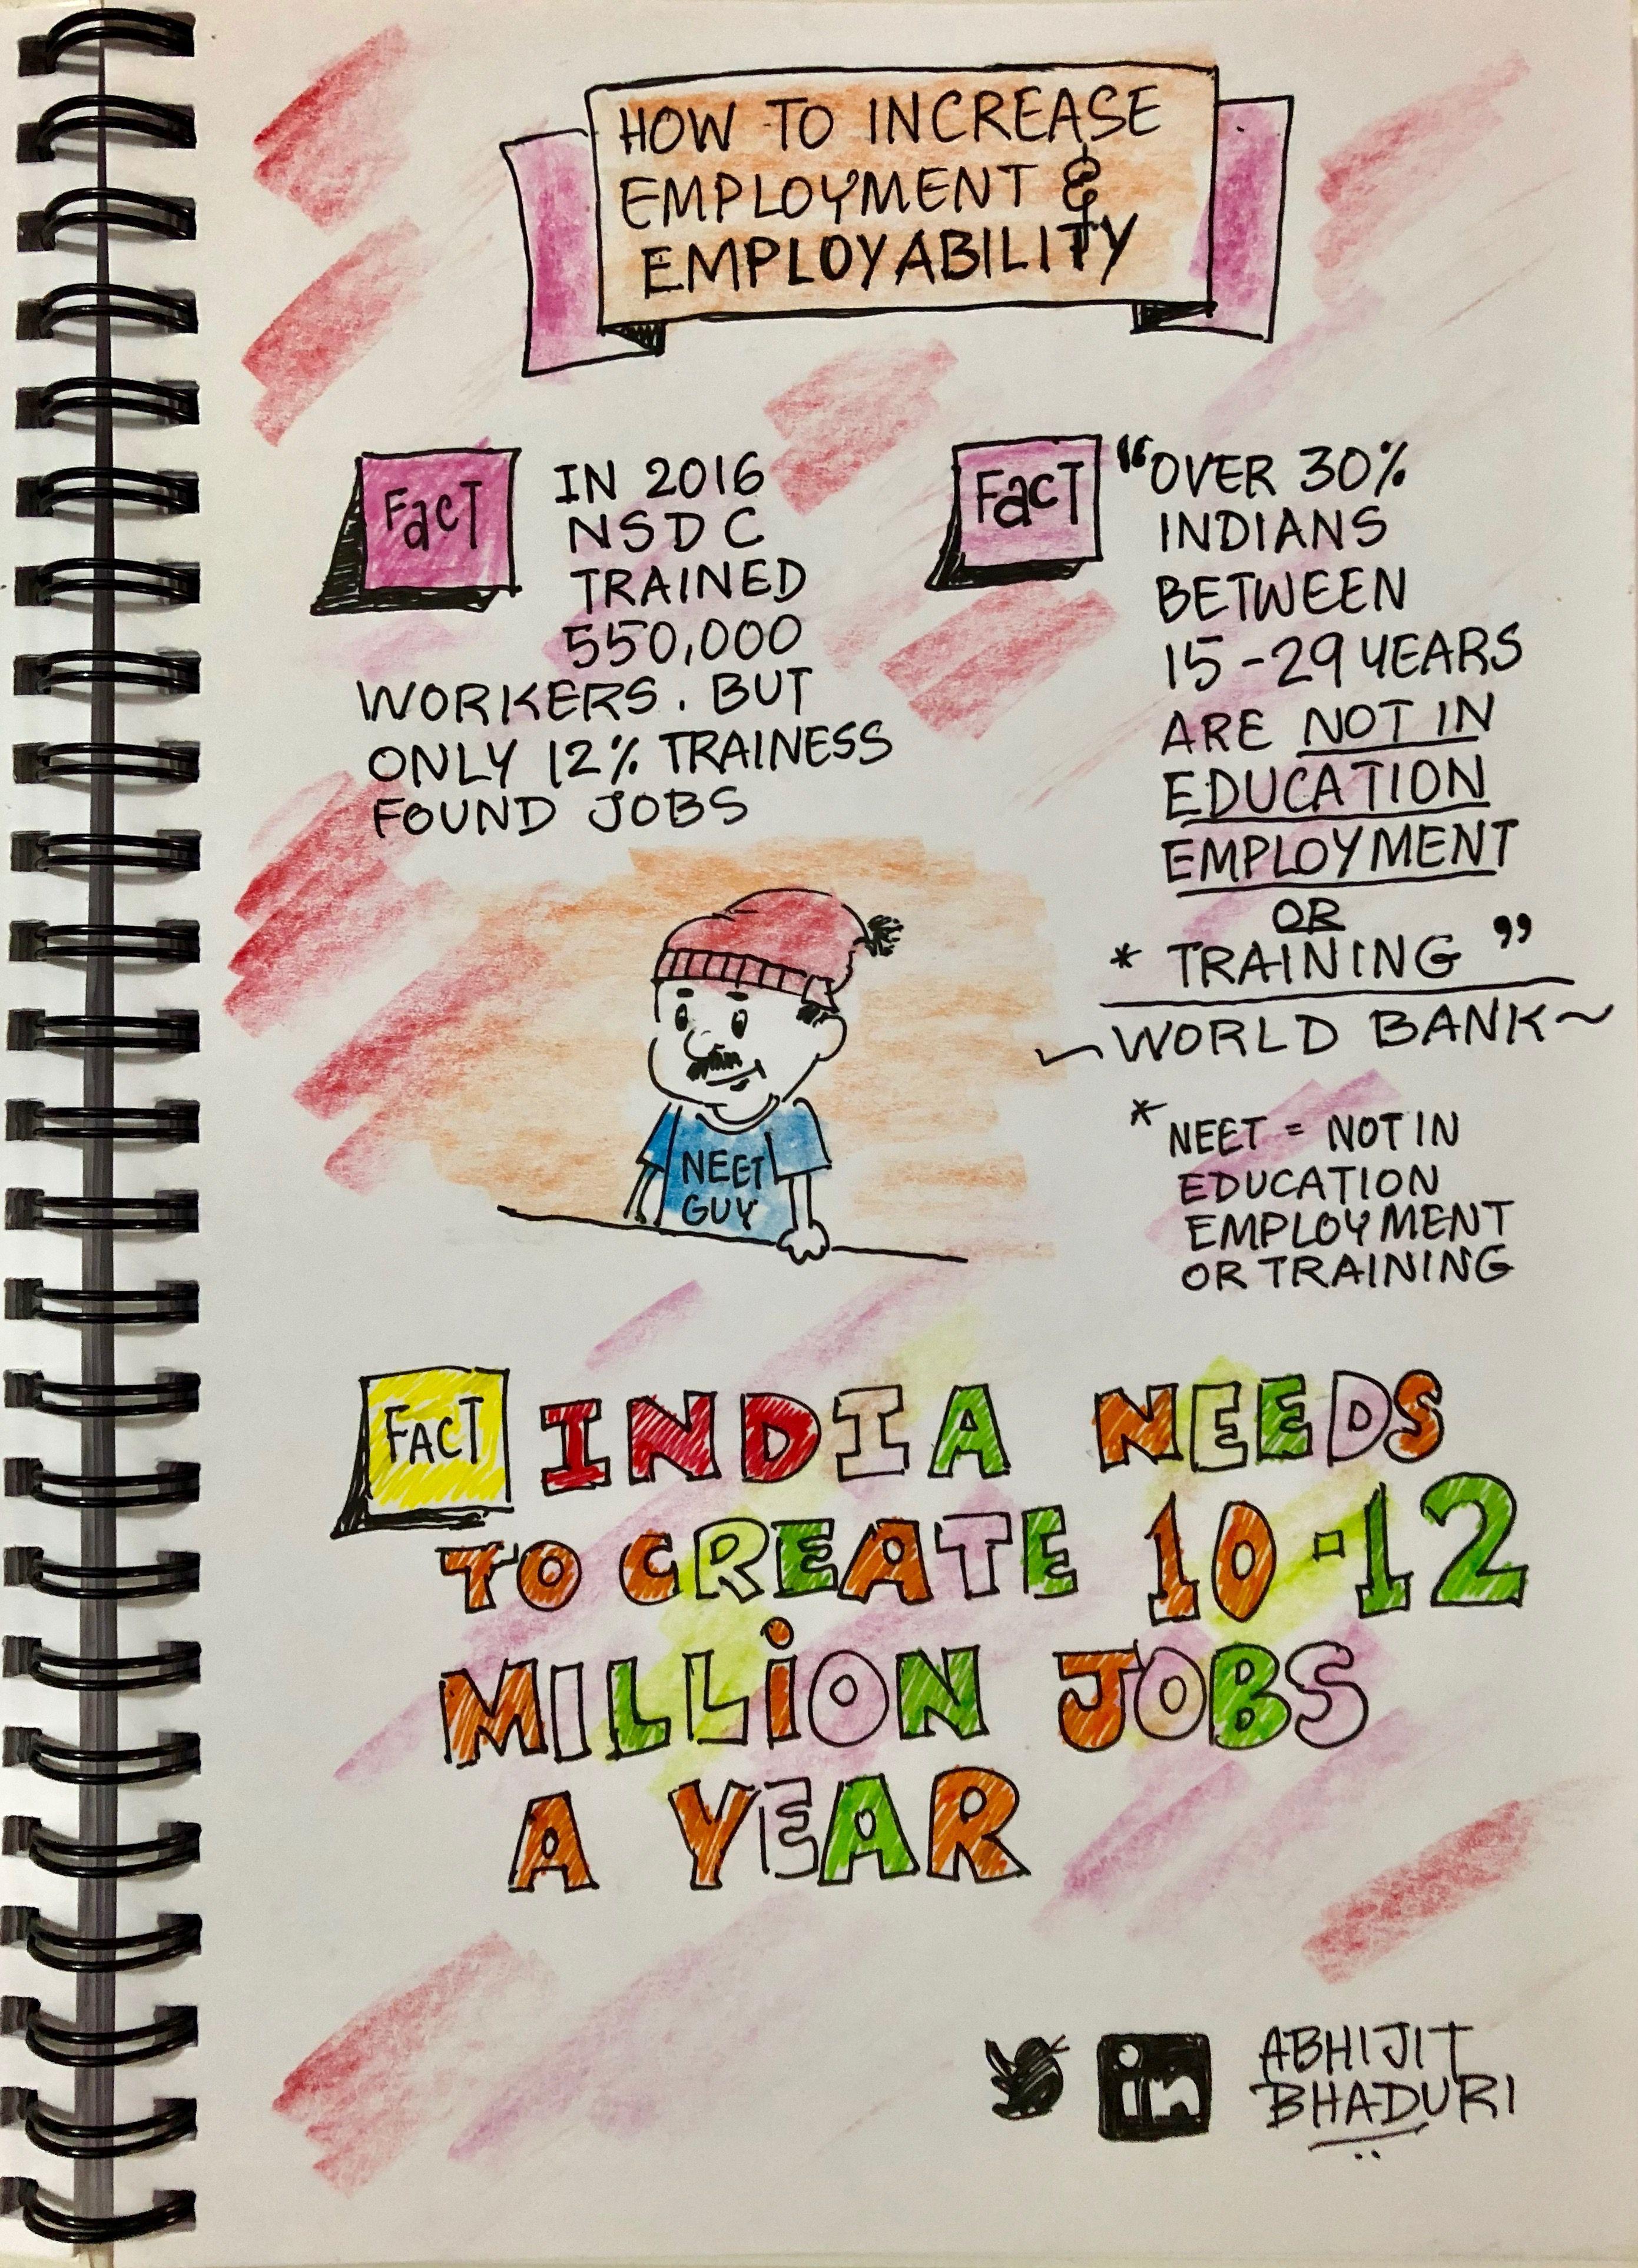 Pin by Abhijit Bhaduri on Sketchnotes Budgeting, Bullet